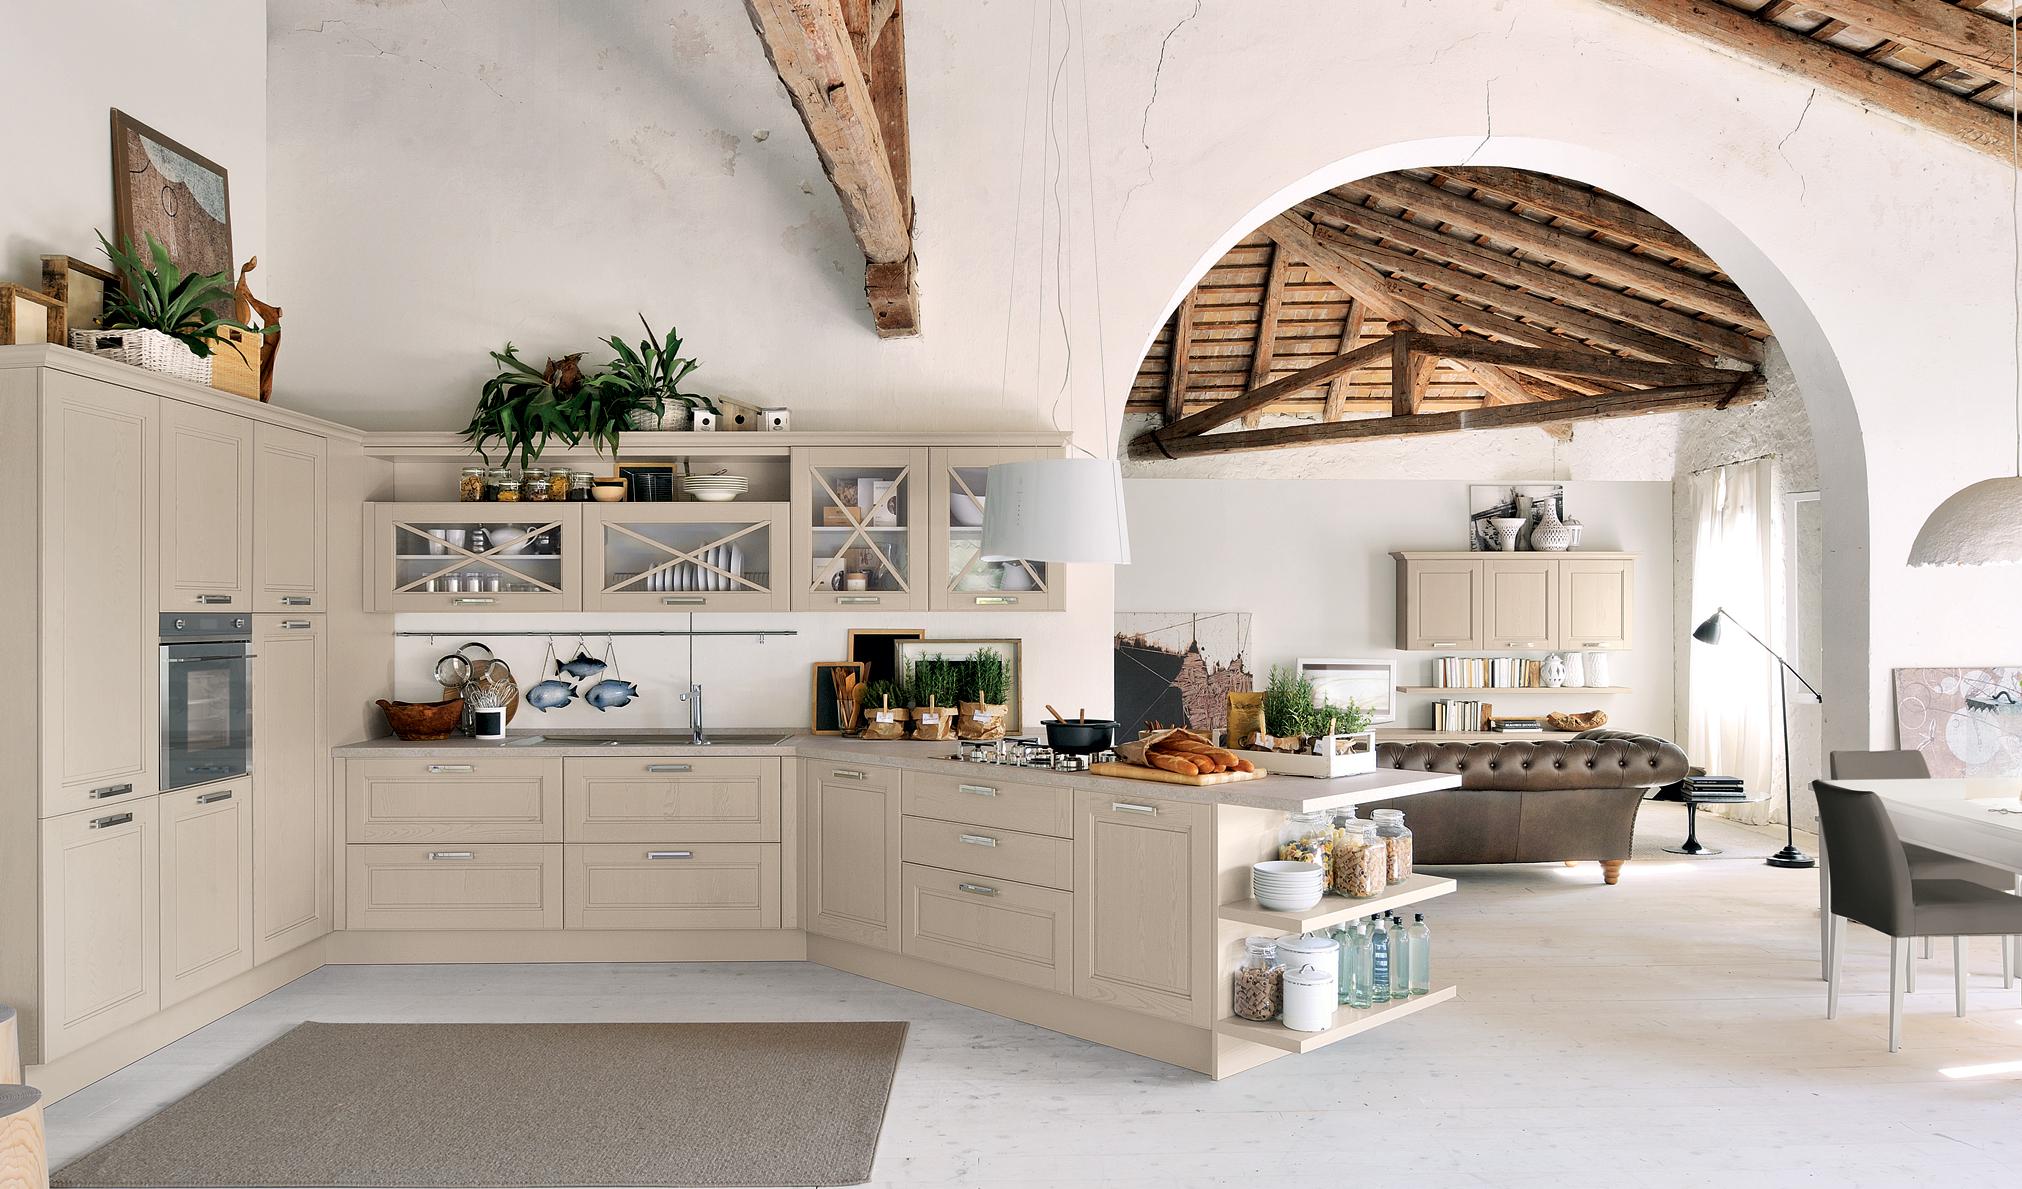 Vintage, lo stile eterno - Cucine Lube